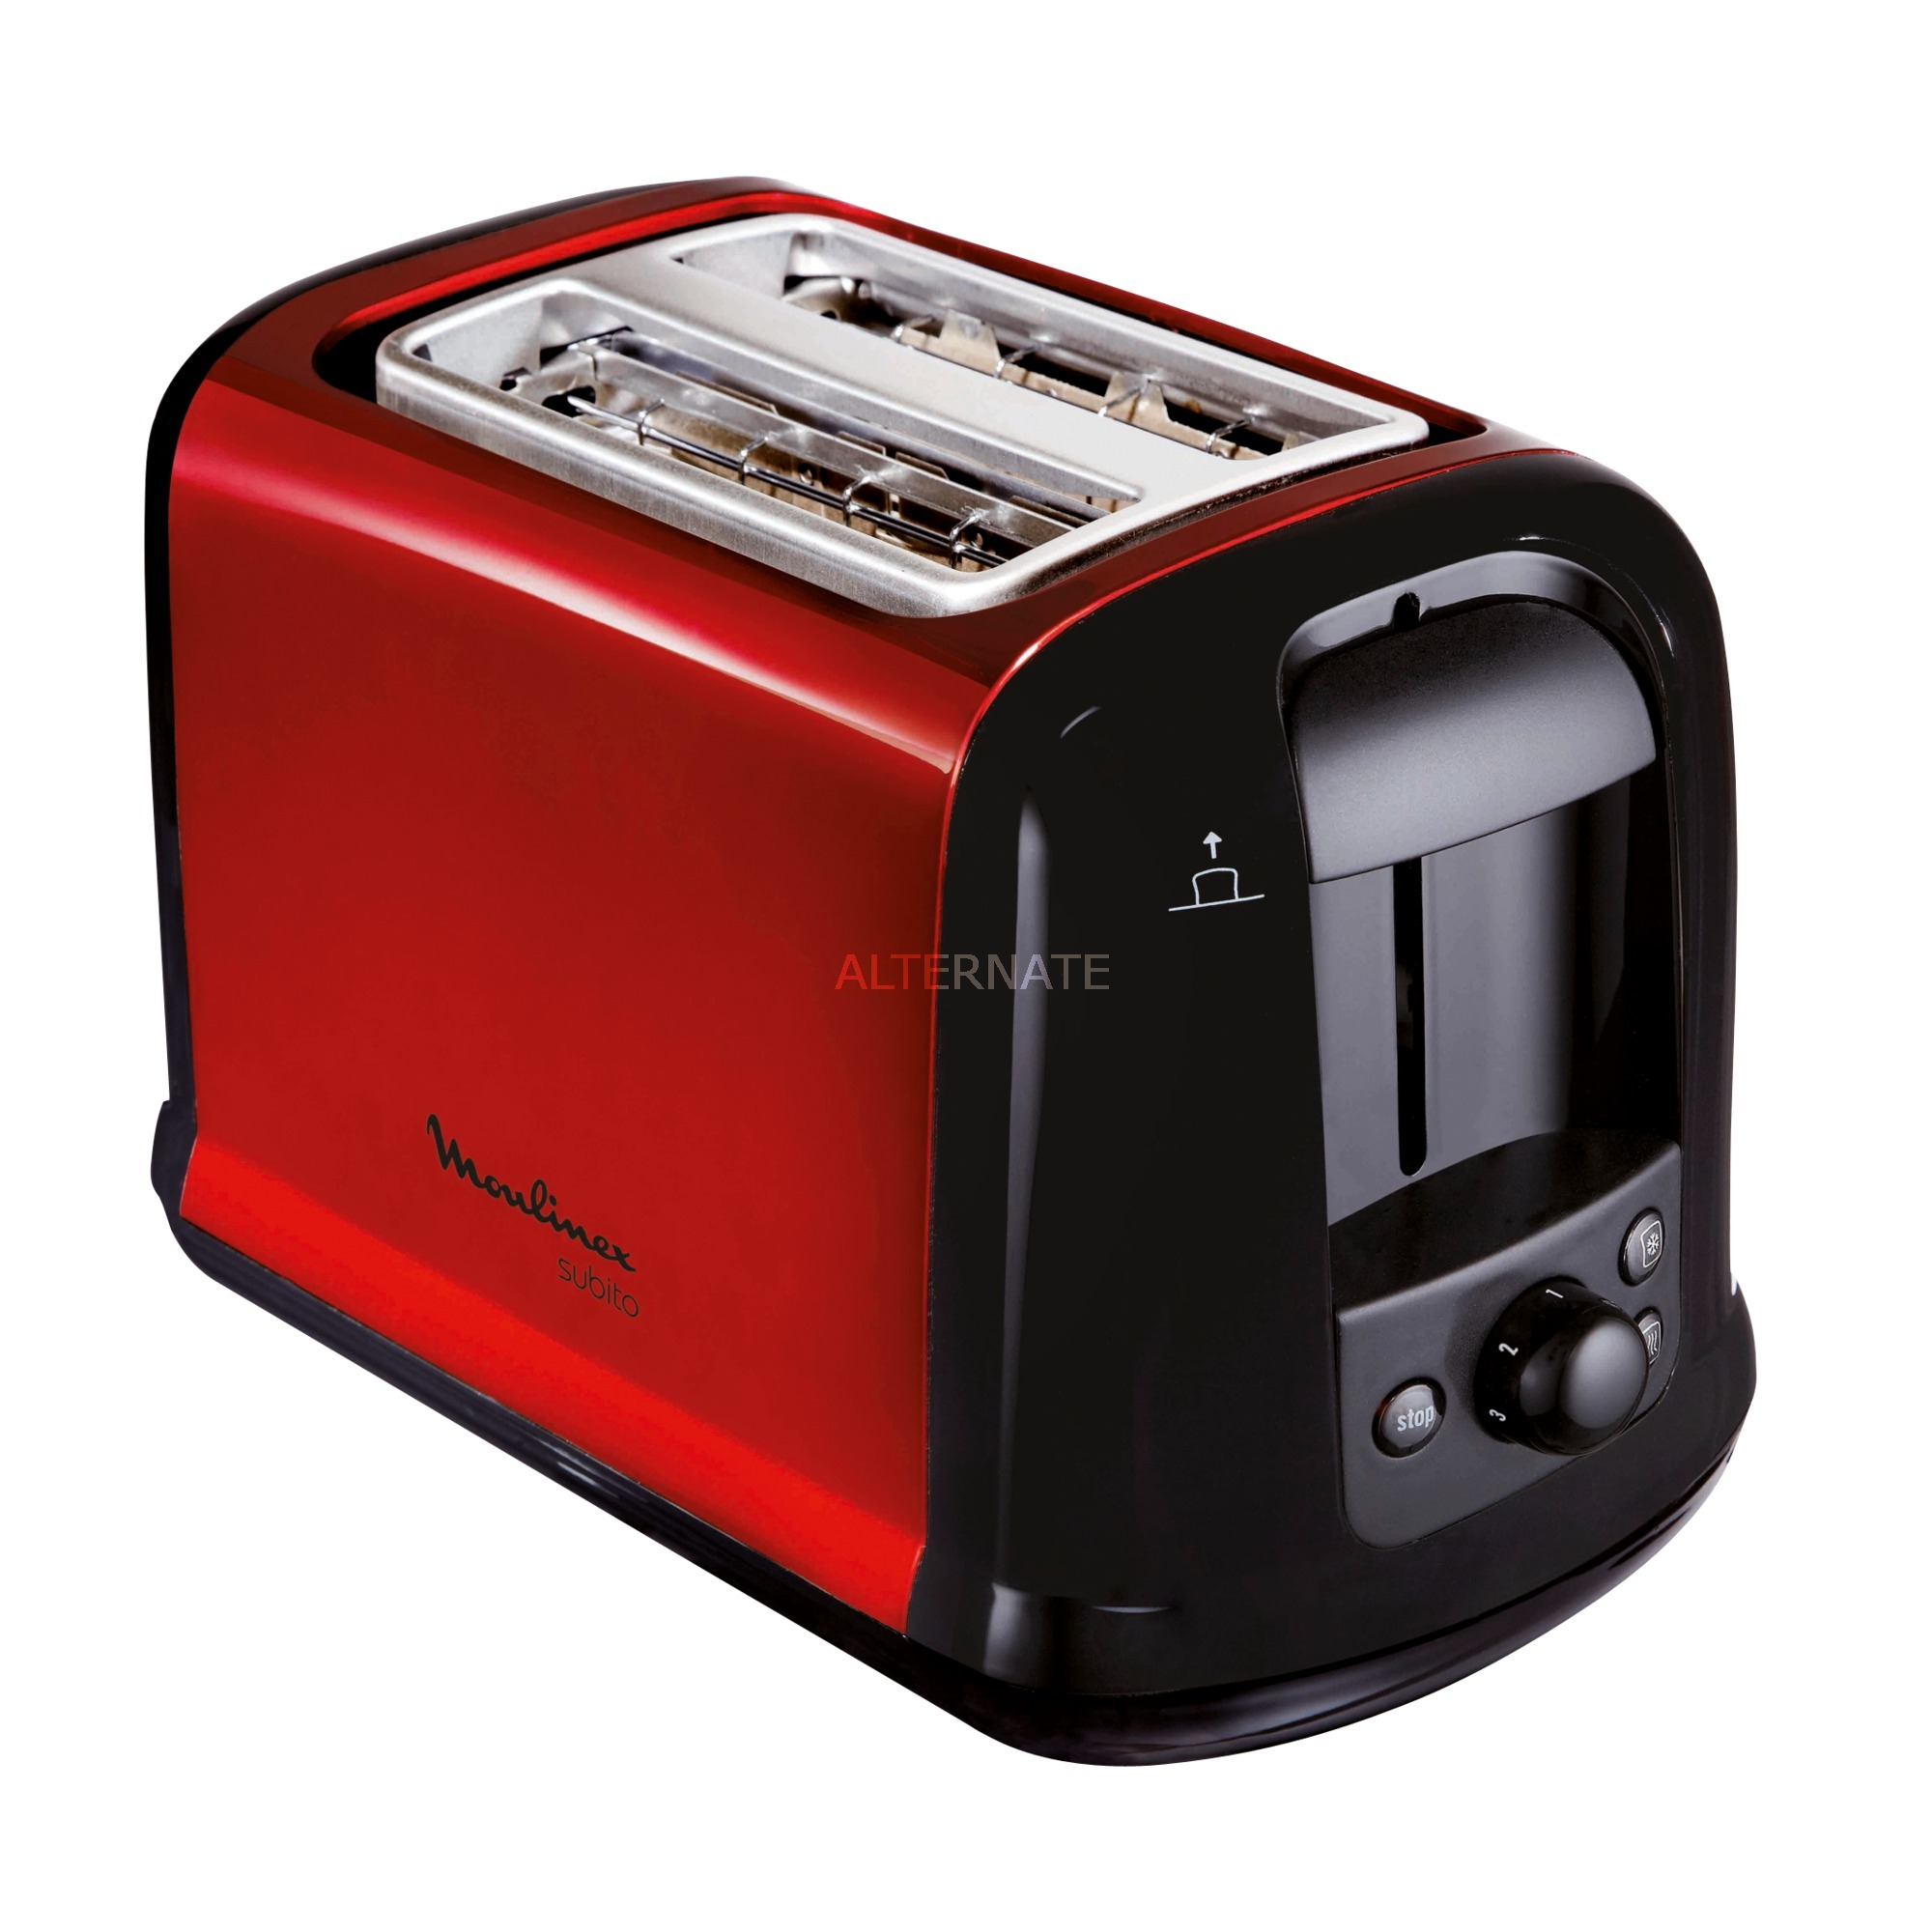 Subitor tostadora 2 rebanada(s) Negro, Rojo 850 W